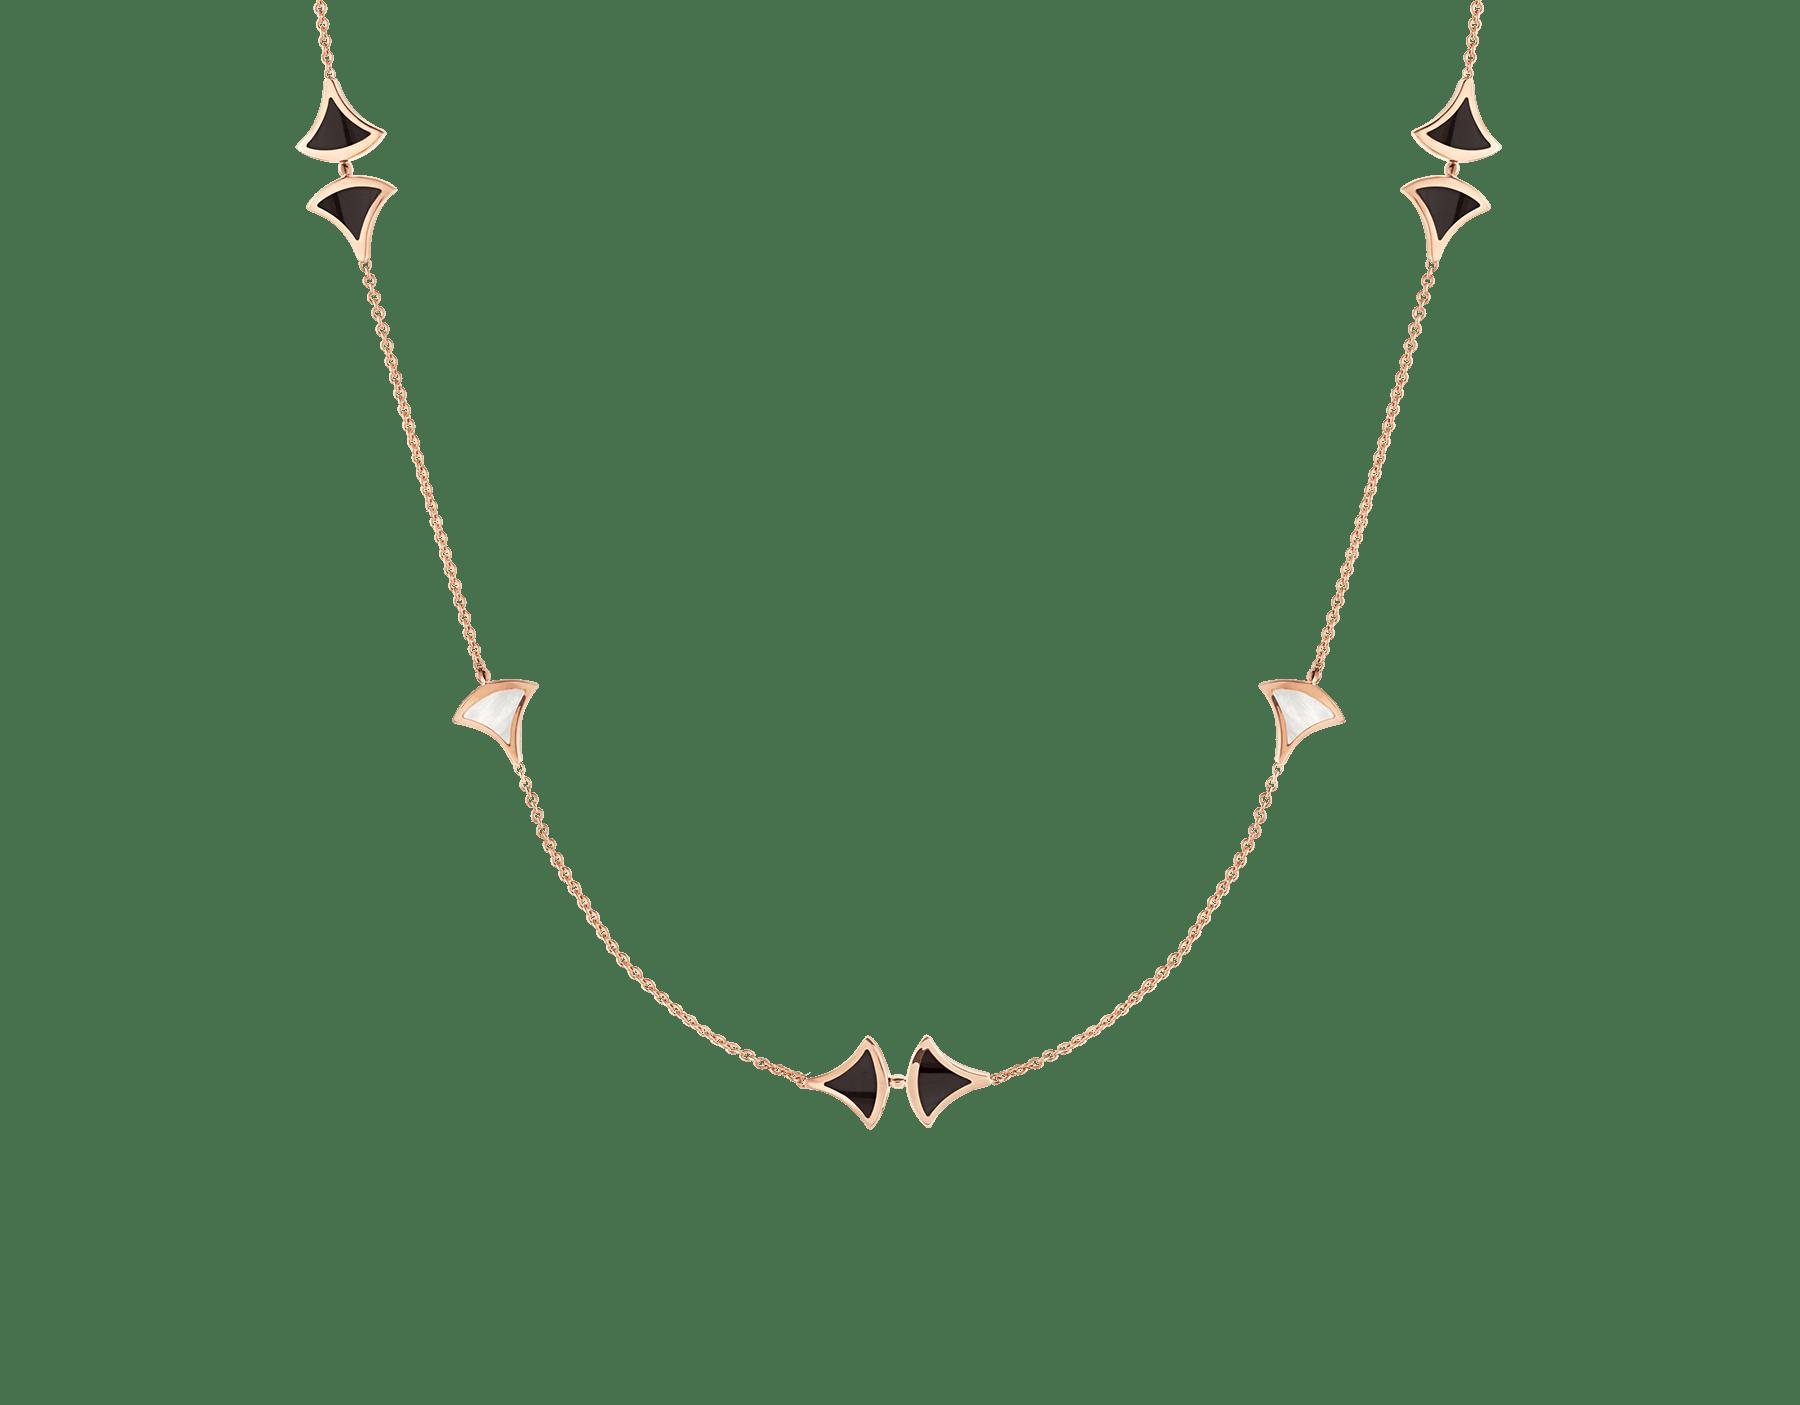 Sautoir DIVAS' DREAM en oro rosa de 18 qt con elementos de madreperla y ónix negro. 350060 image 1